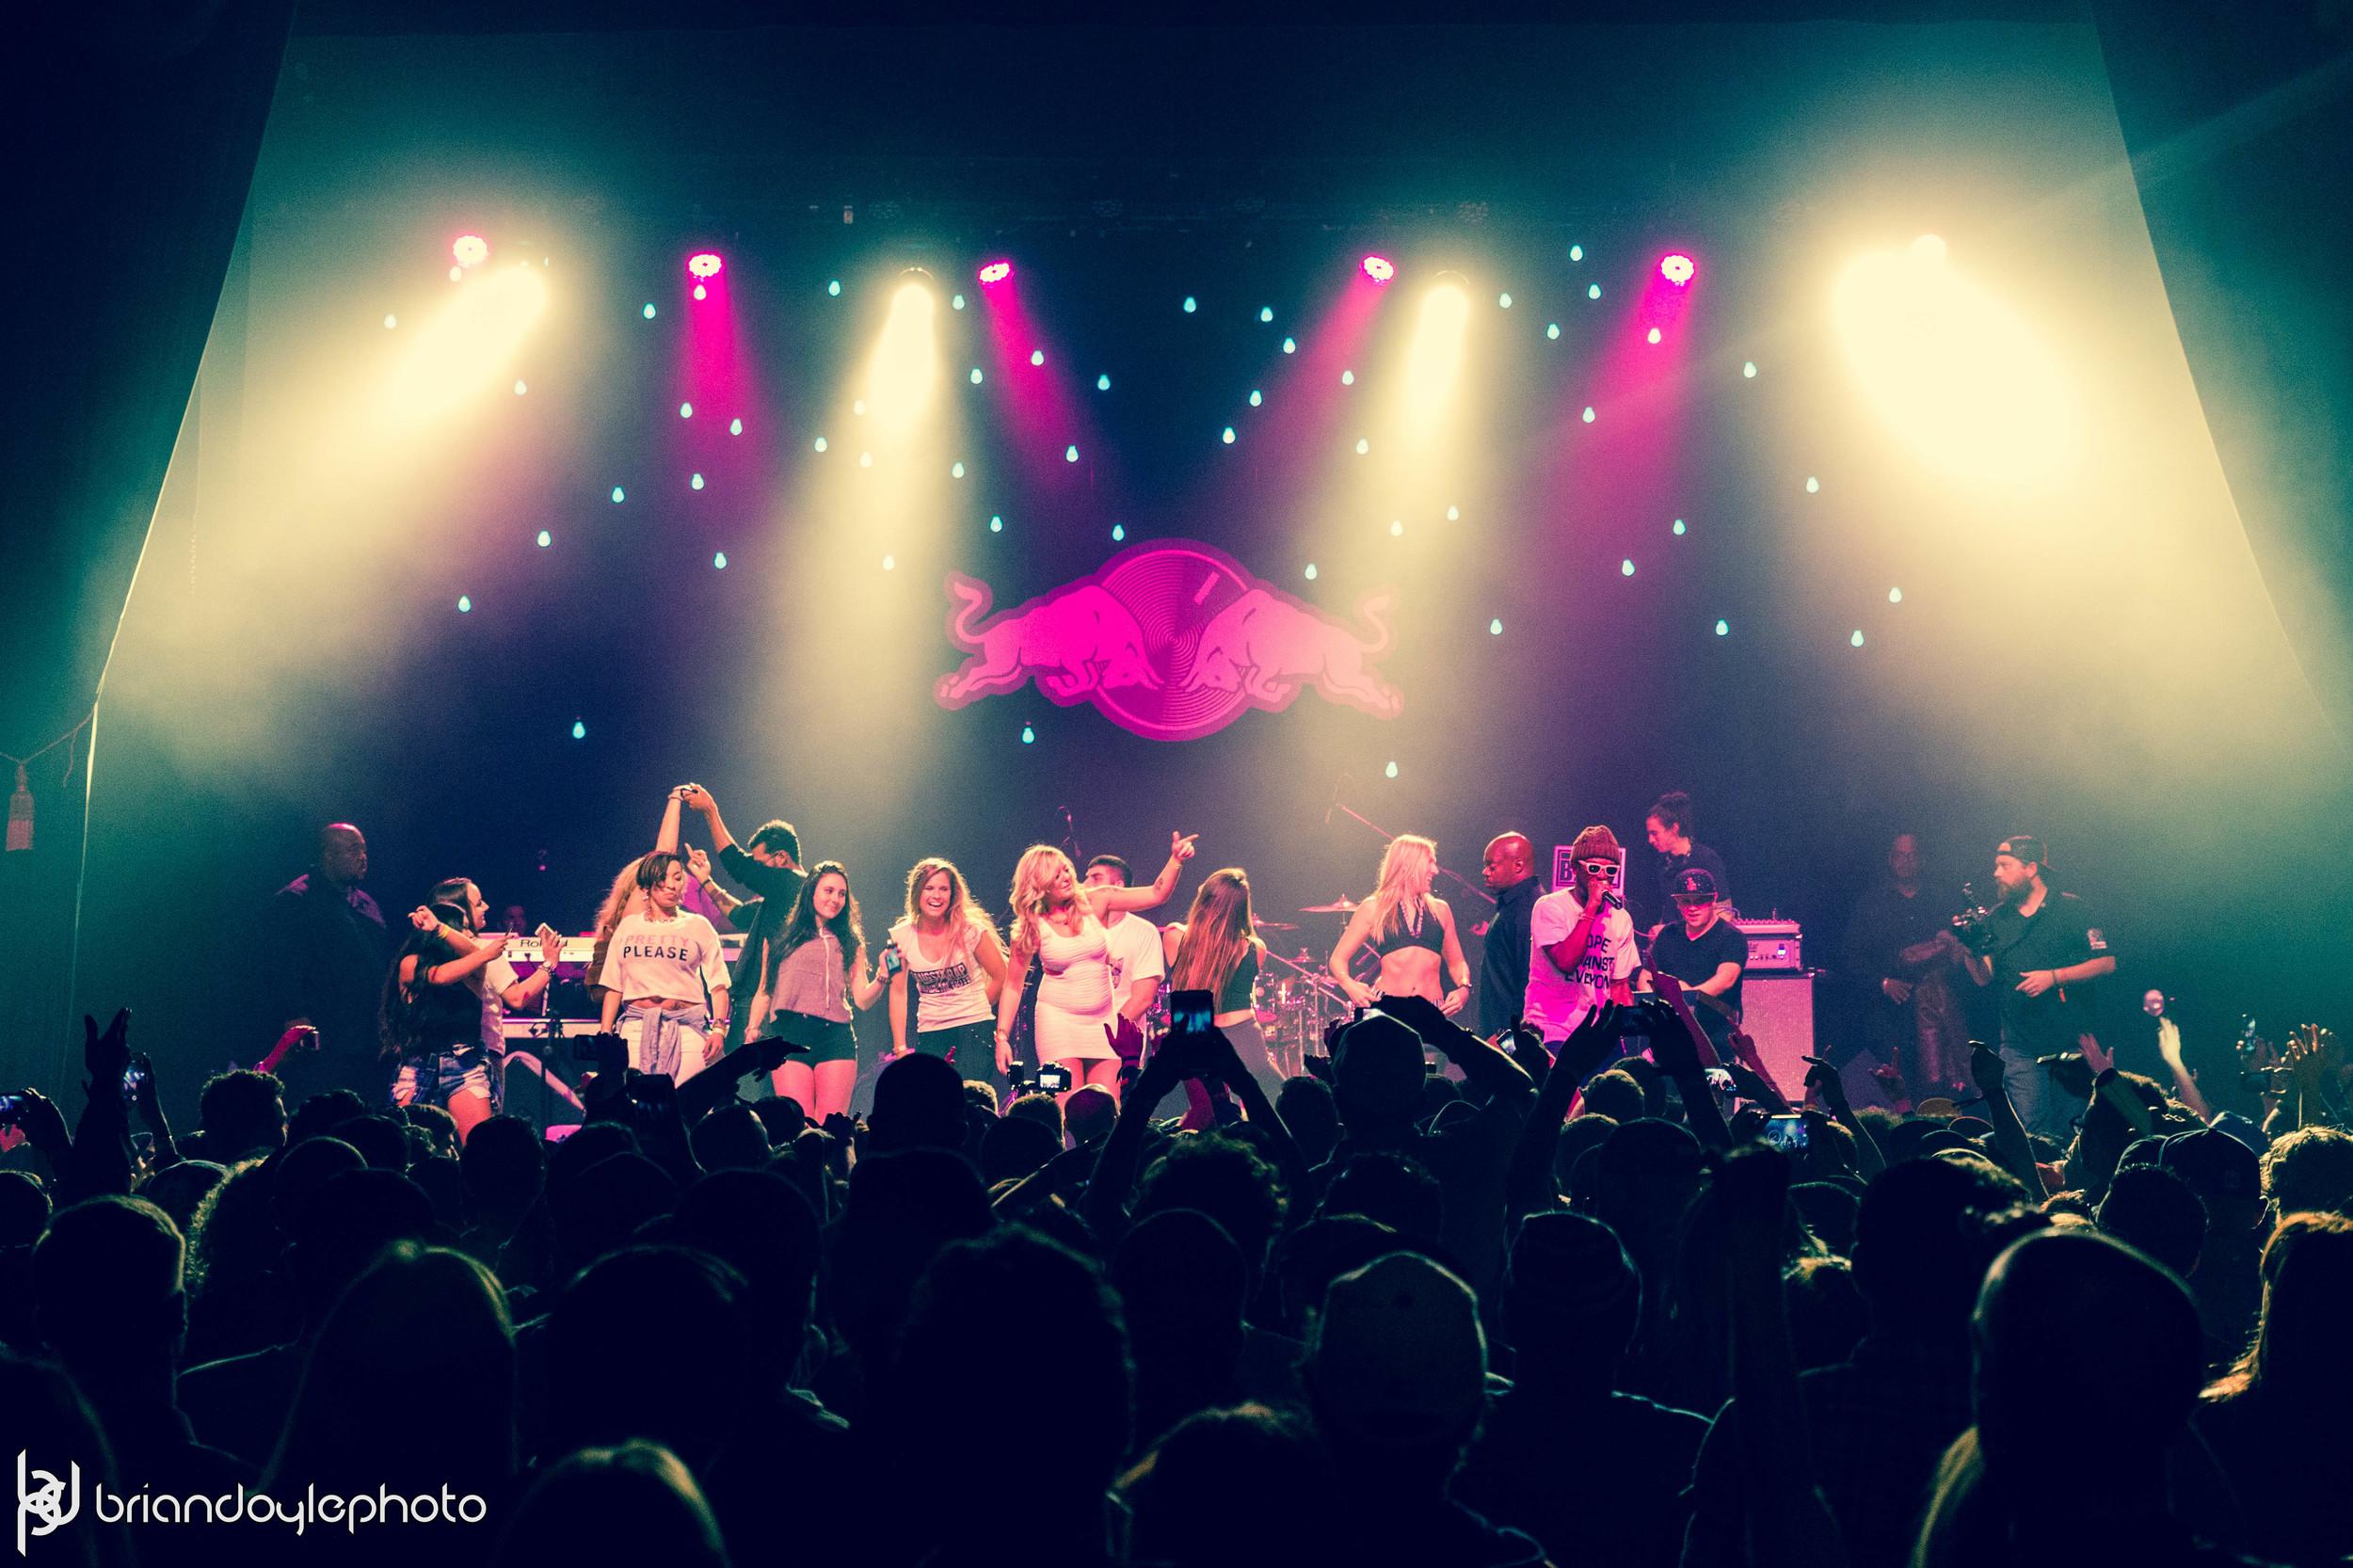 Lil Wayne, Juicy J, Two-9, Tree @ The Fonda 25.11.2014-44.jpg